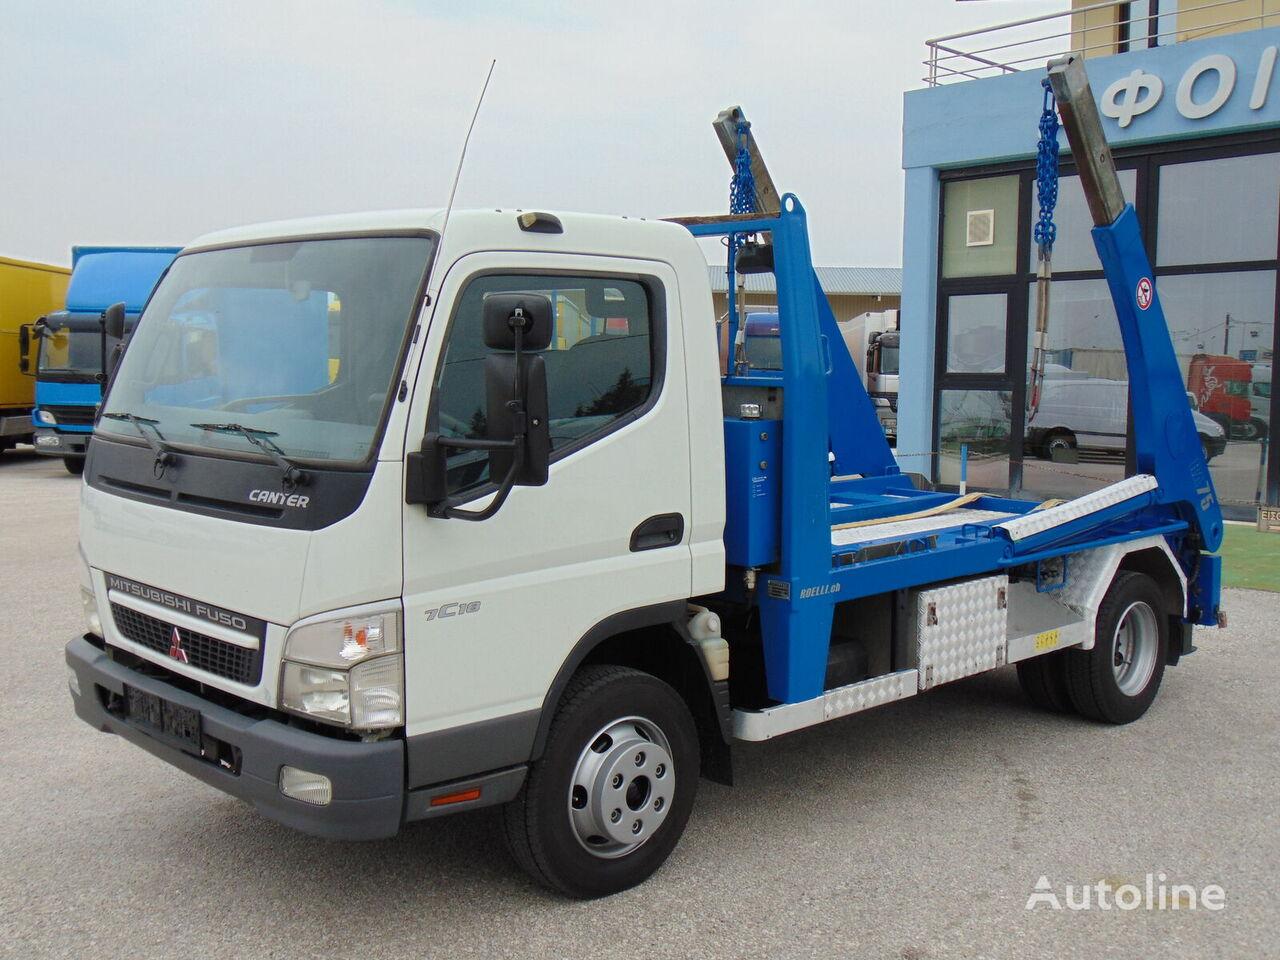 MITSUBISHI FUSO CANTER 7C18 kravas automašīna konteinera vedējs